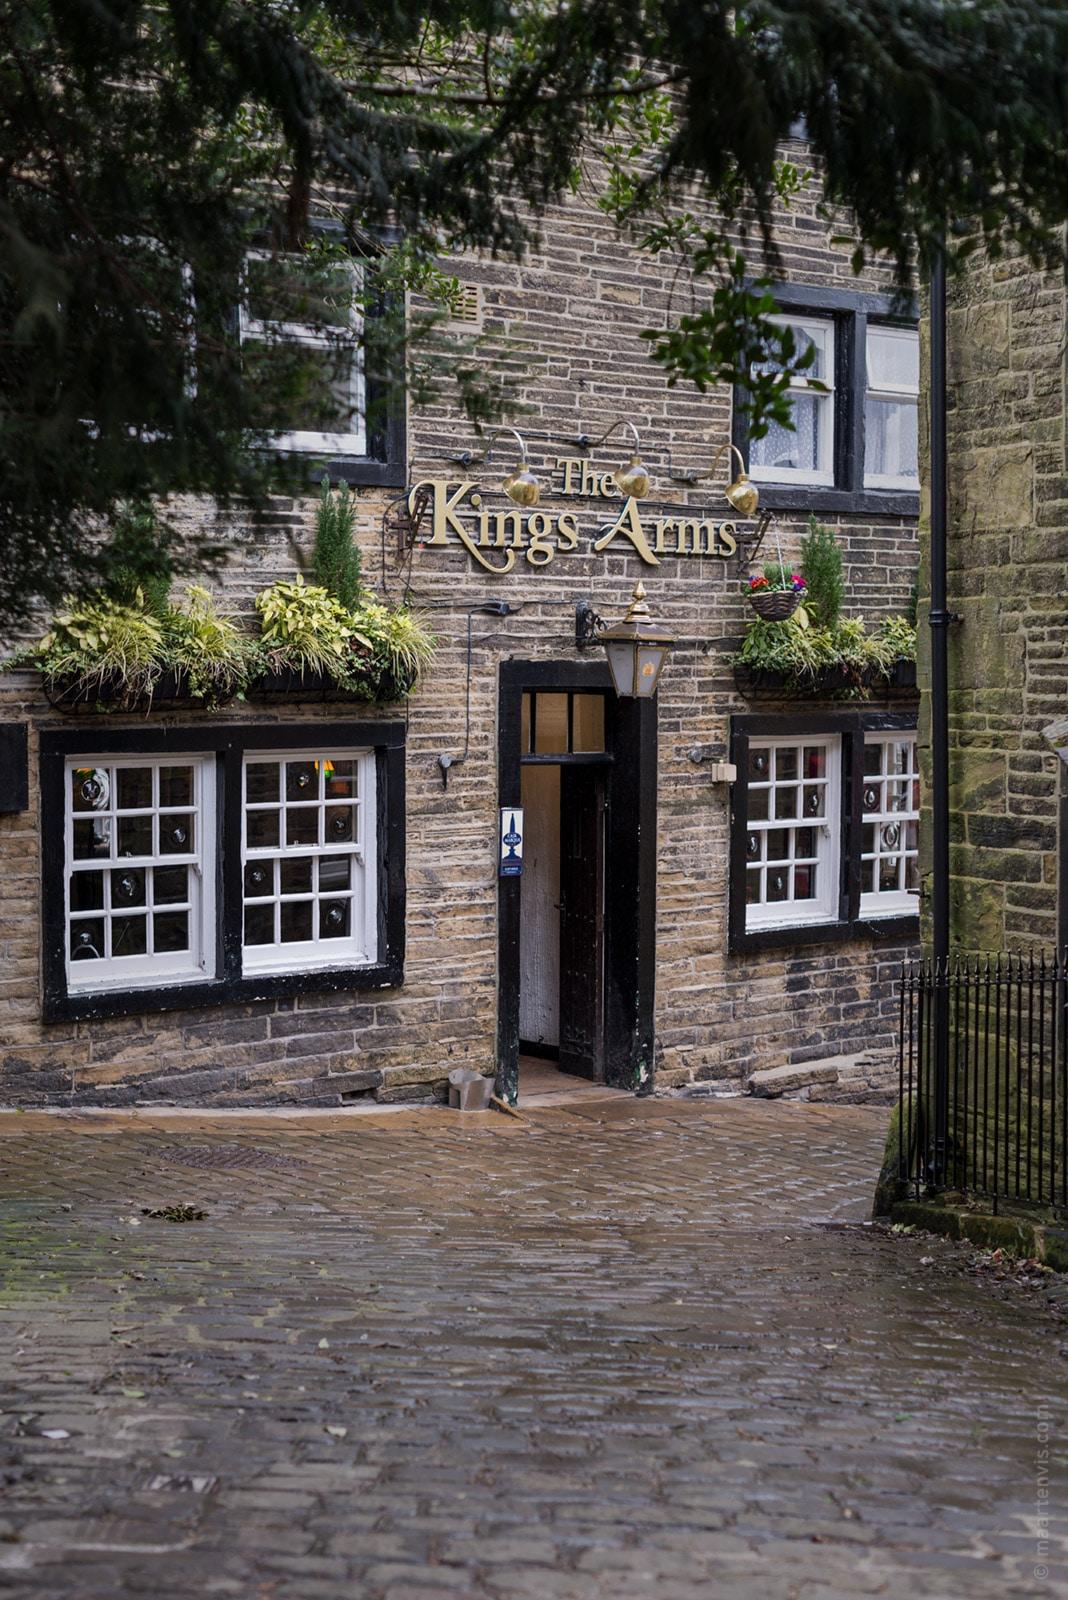 20160324 8036 - Visiting Haworth Yorkshire